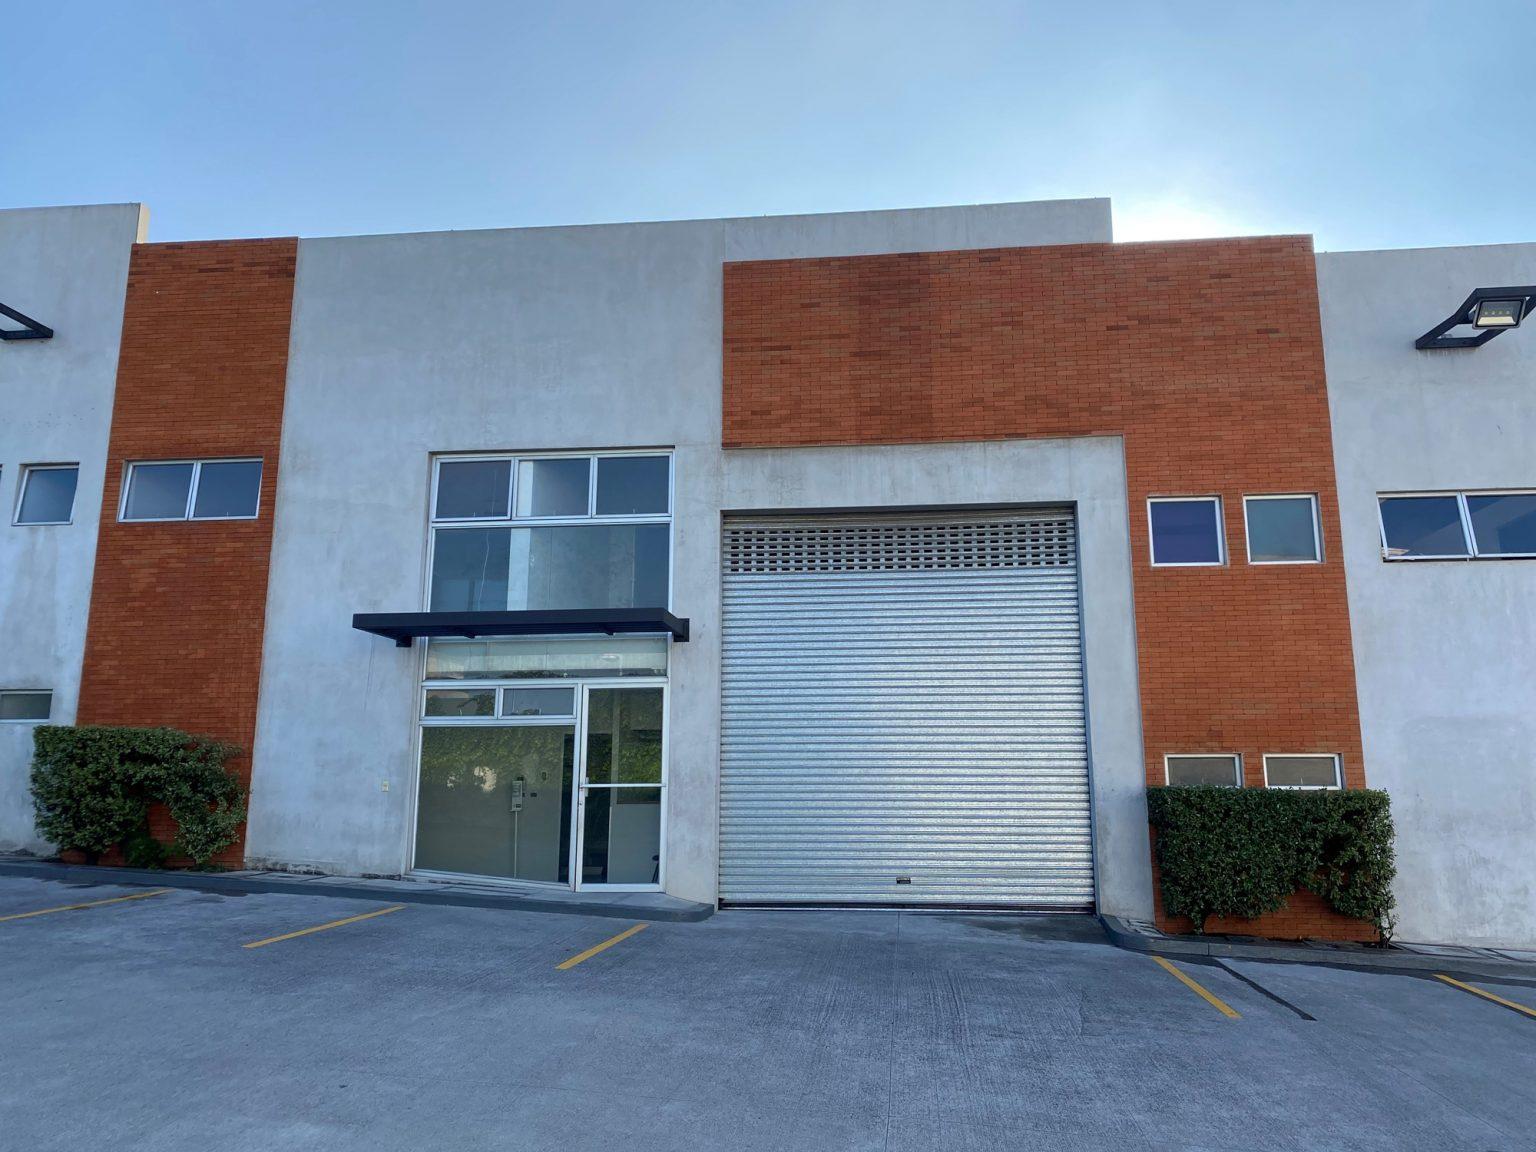 Ofibodega | alquiler | Expobodega | Avenida Petapa | zona 12